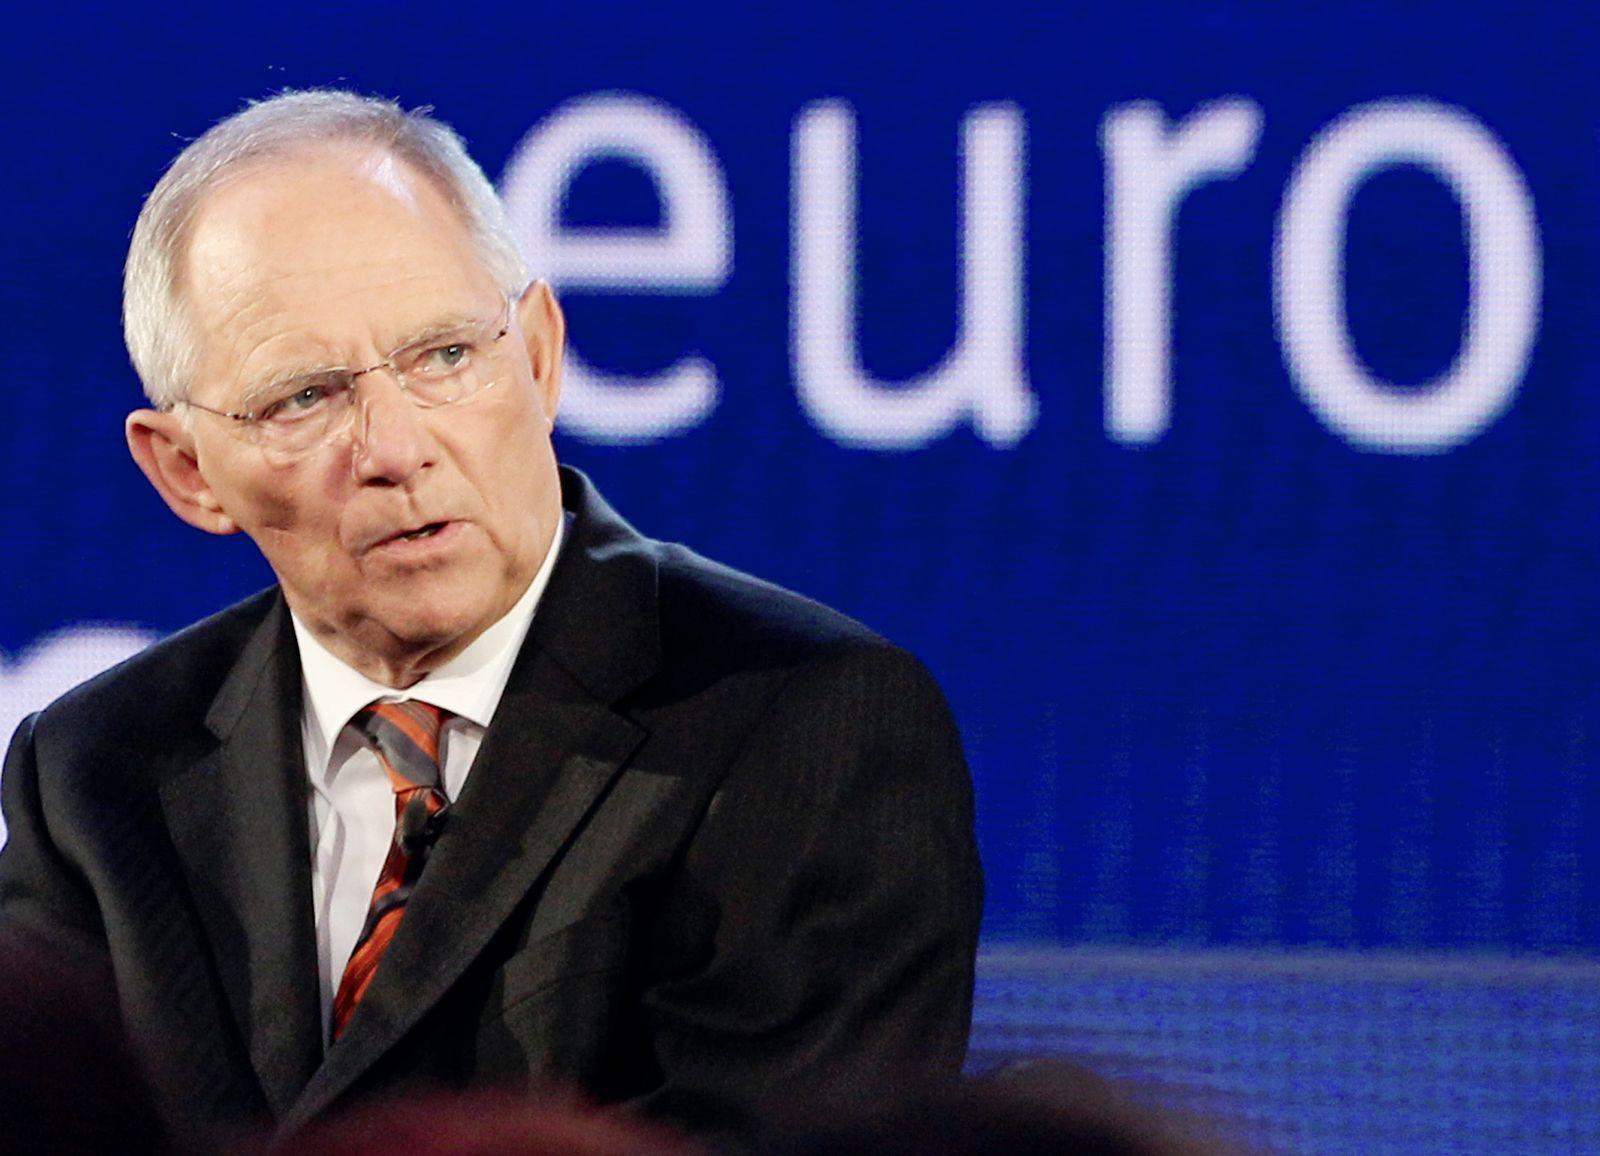 Wolfgang Schäuble / Euro